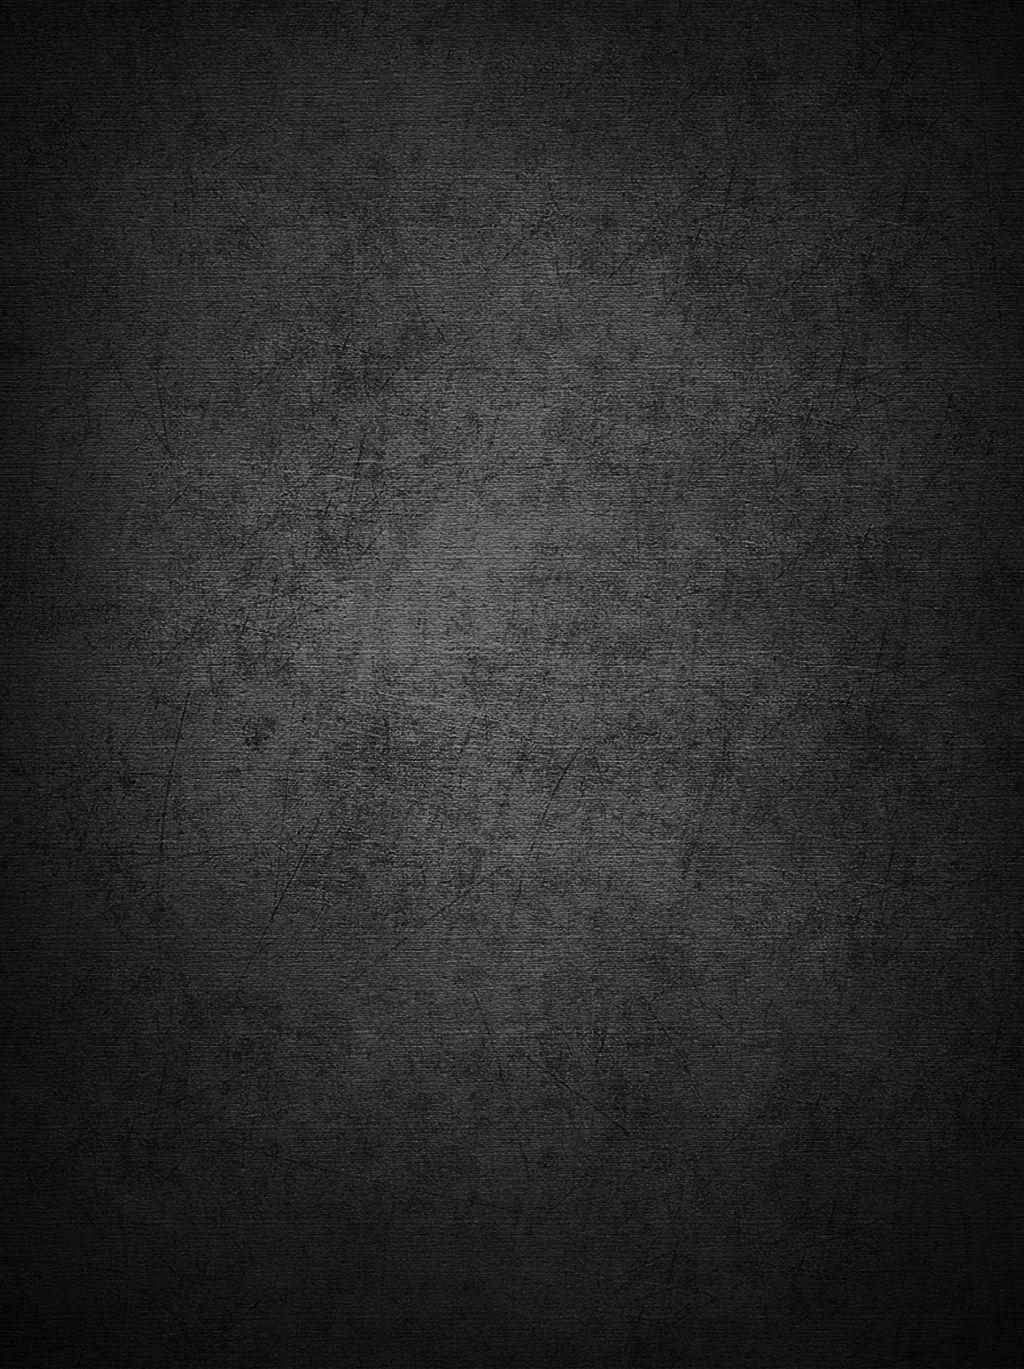 Stucco Texture Cement Textured Background Em 2020 Molde De